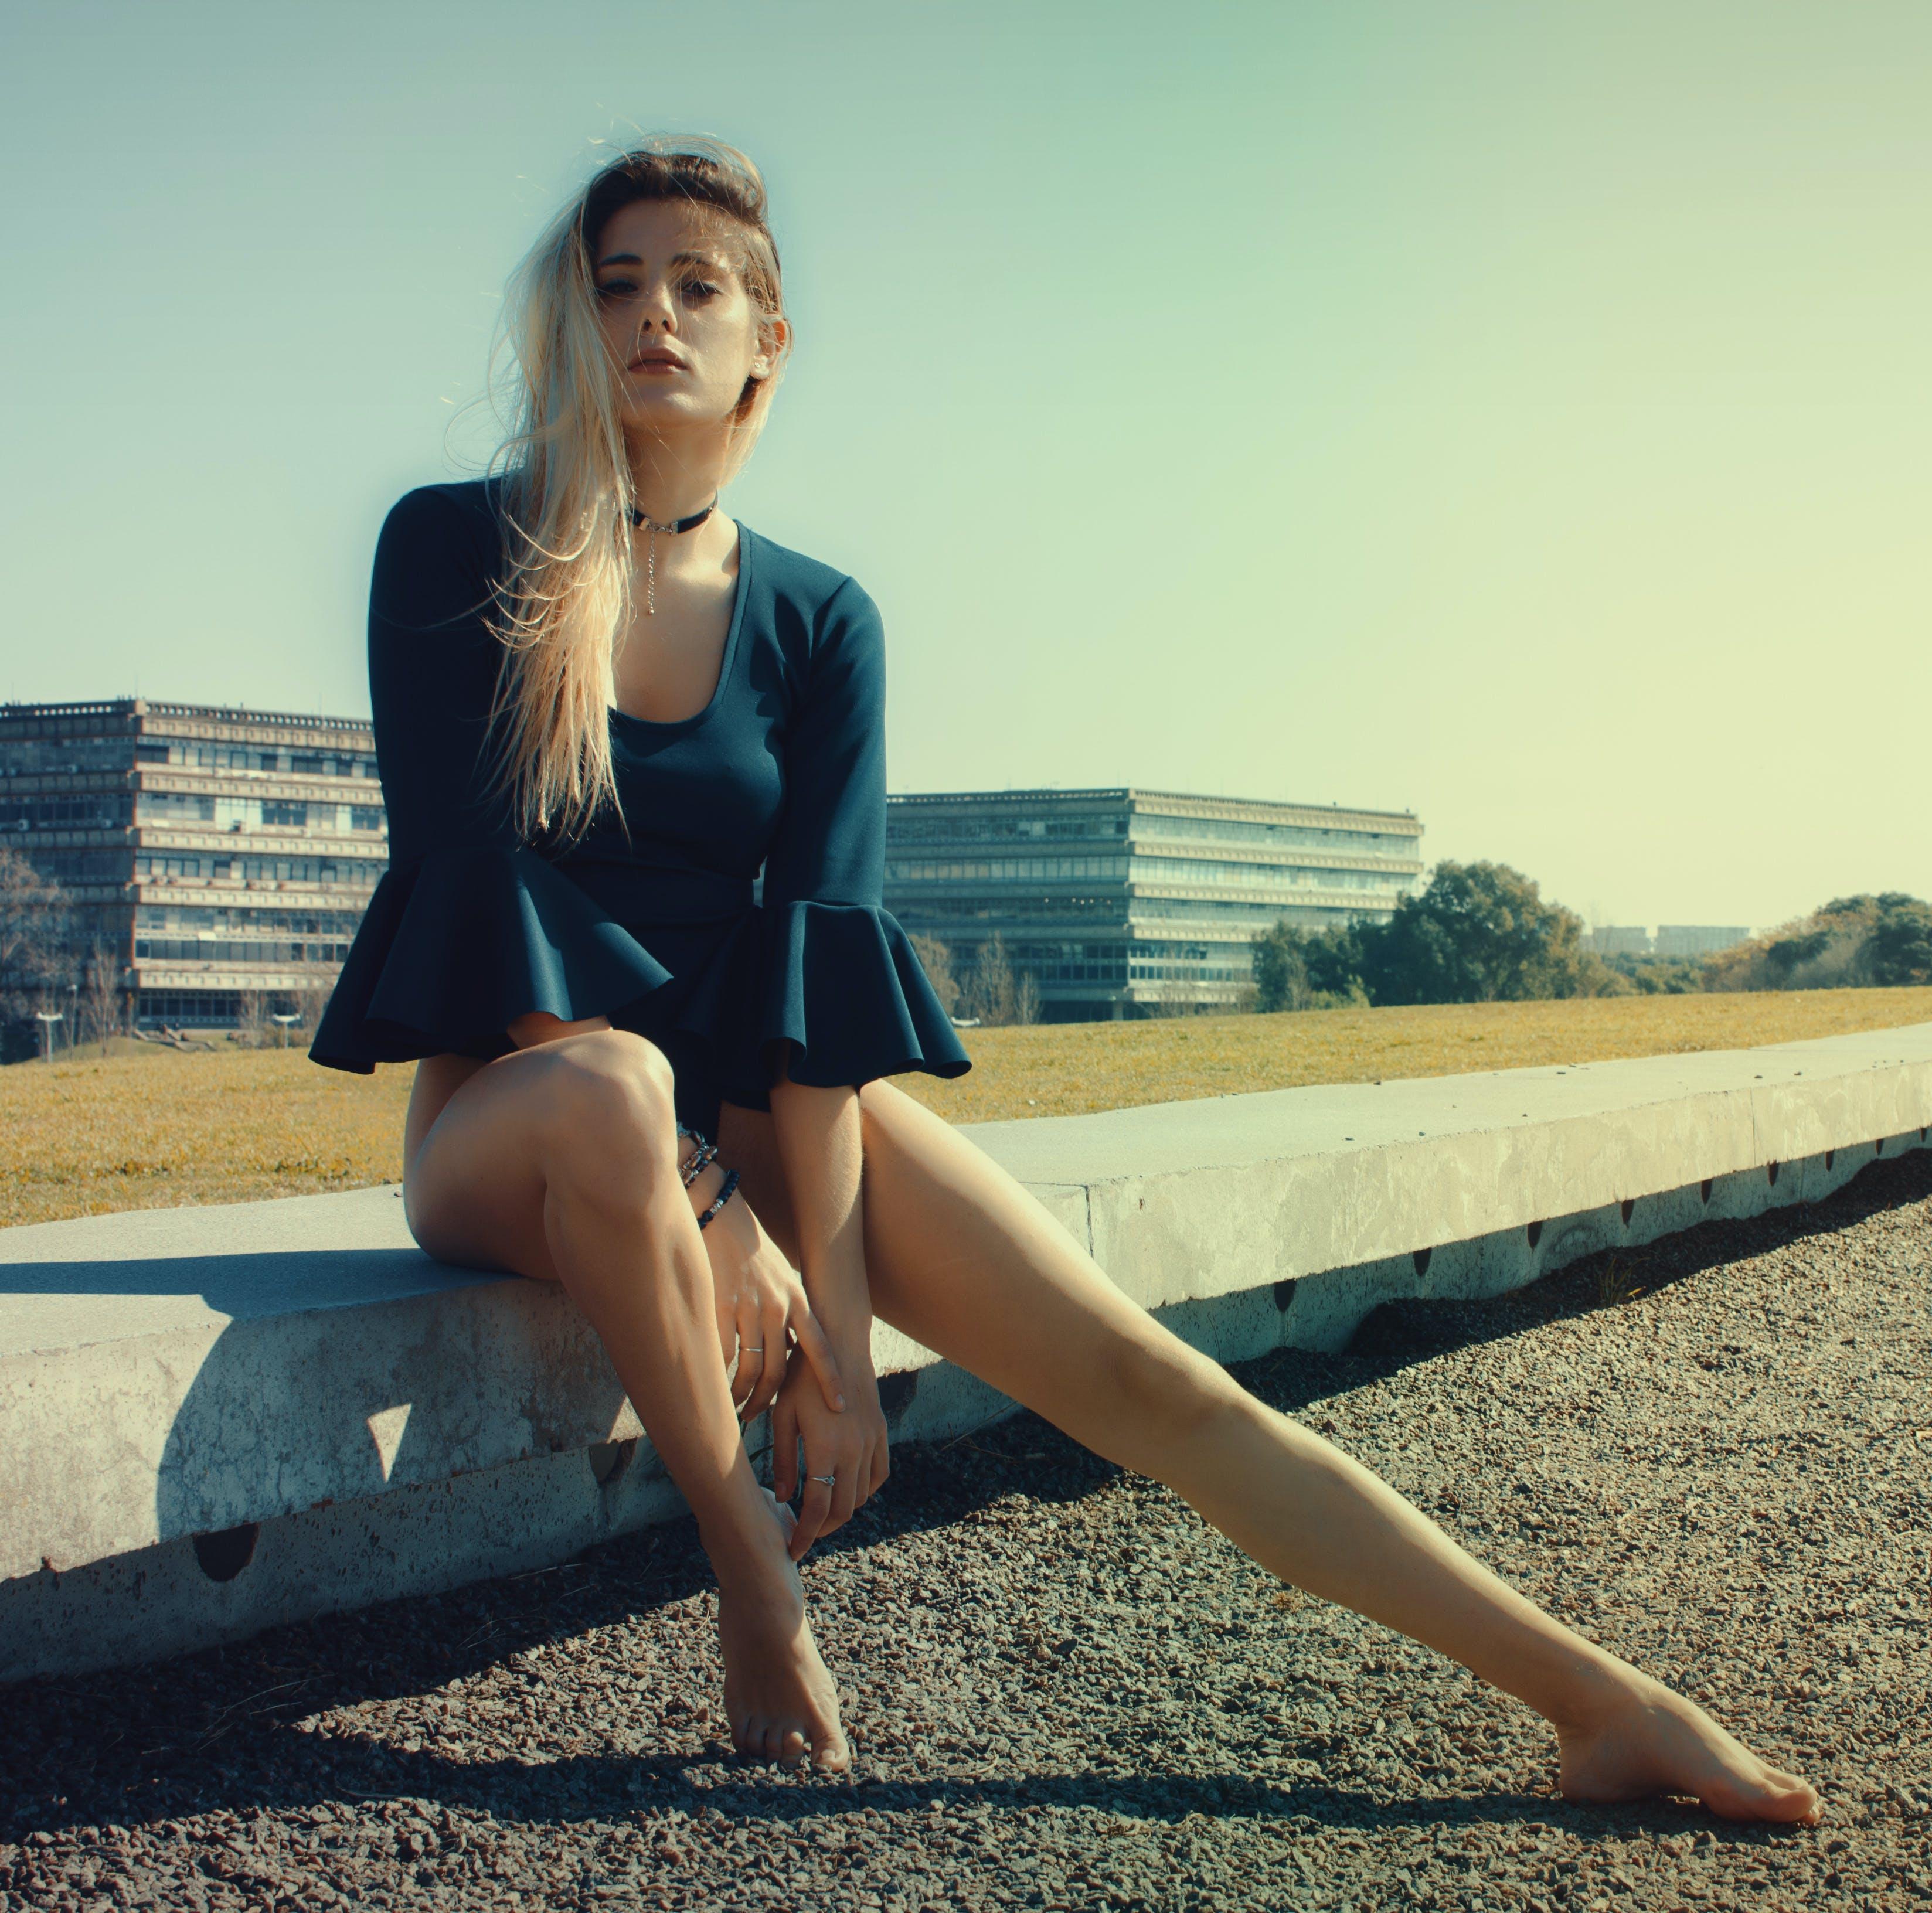 Woman Wears Black Scoop-neck Long-sleeved Blouse Seats on Grey Concrete Pavement